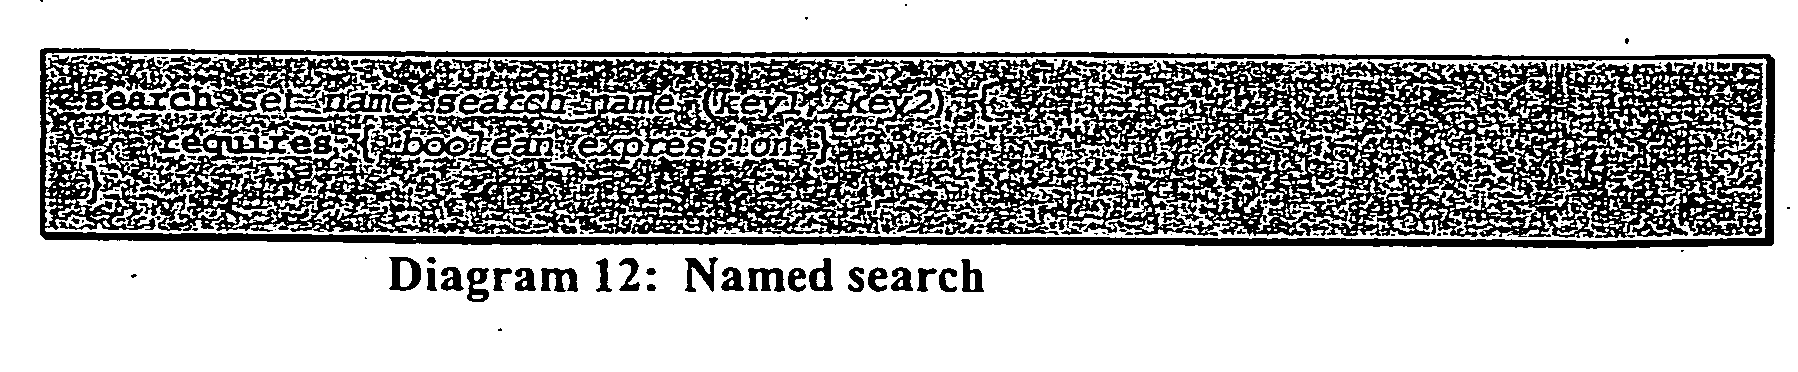 Figure US20040148382A1-20040729-P00014